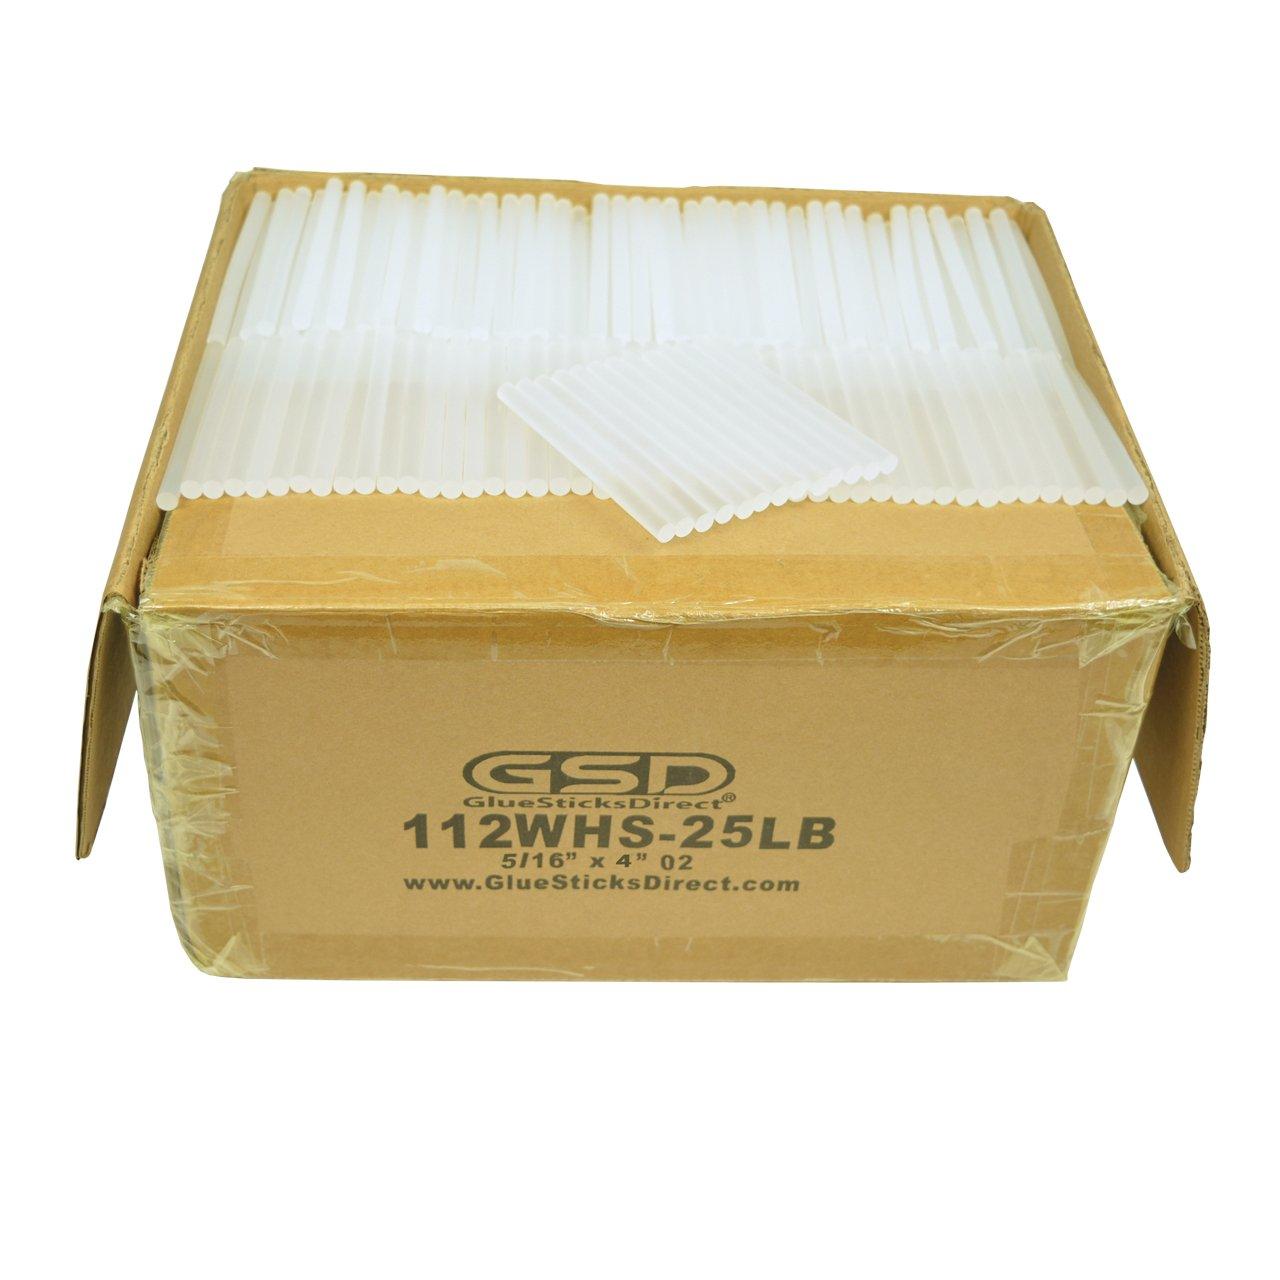 GlueSticksDirect Wholesale Hot Melt Glue Stick Mini X 4'' 25 lbs Bulk by GlueSticksDirect.com